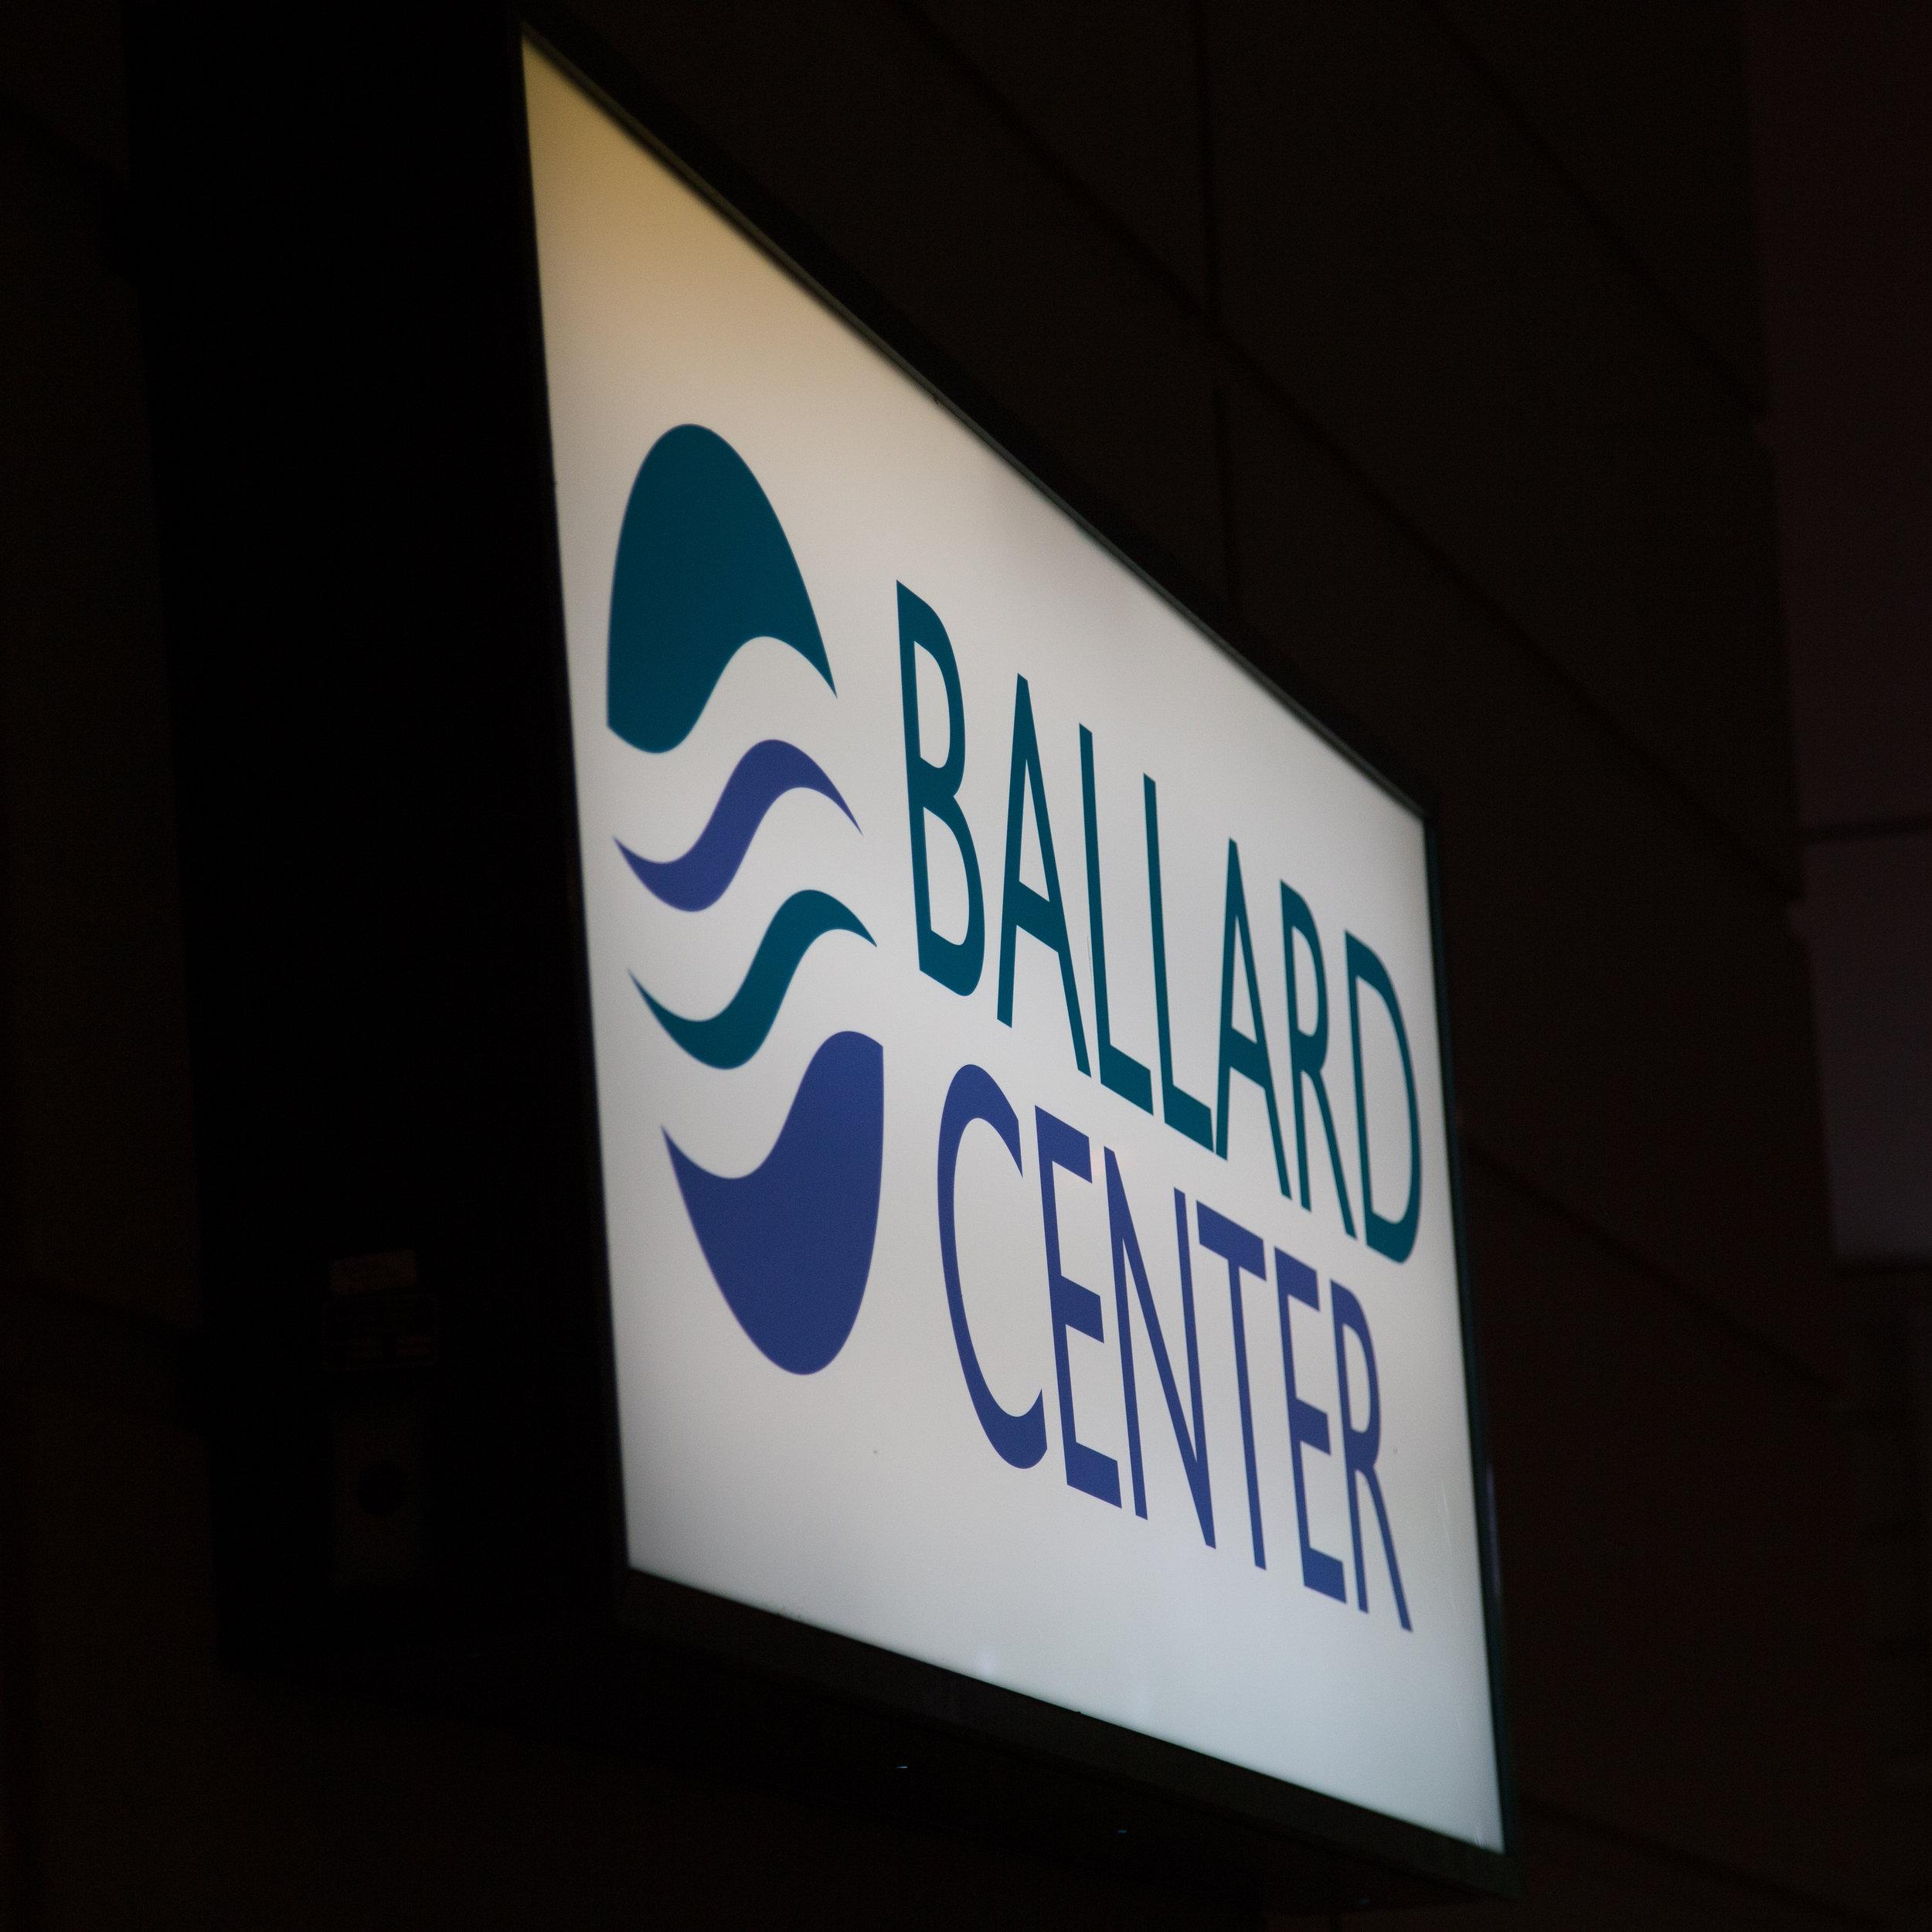 Ballard Center, Augusta, ME